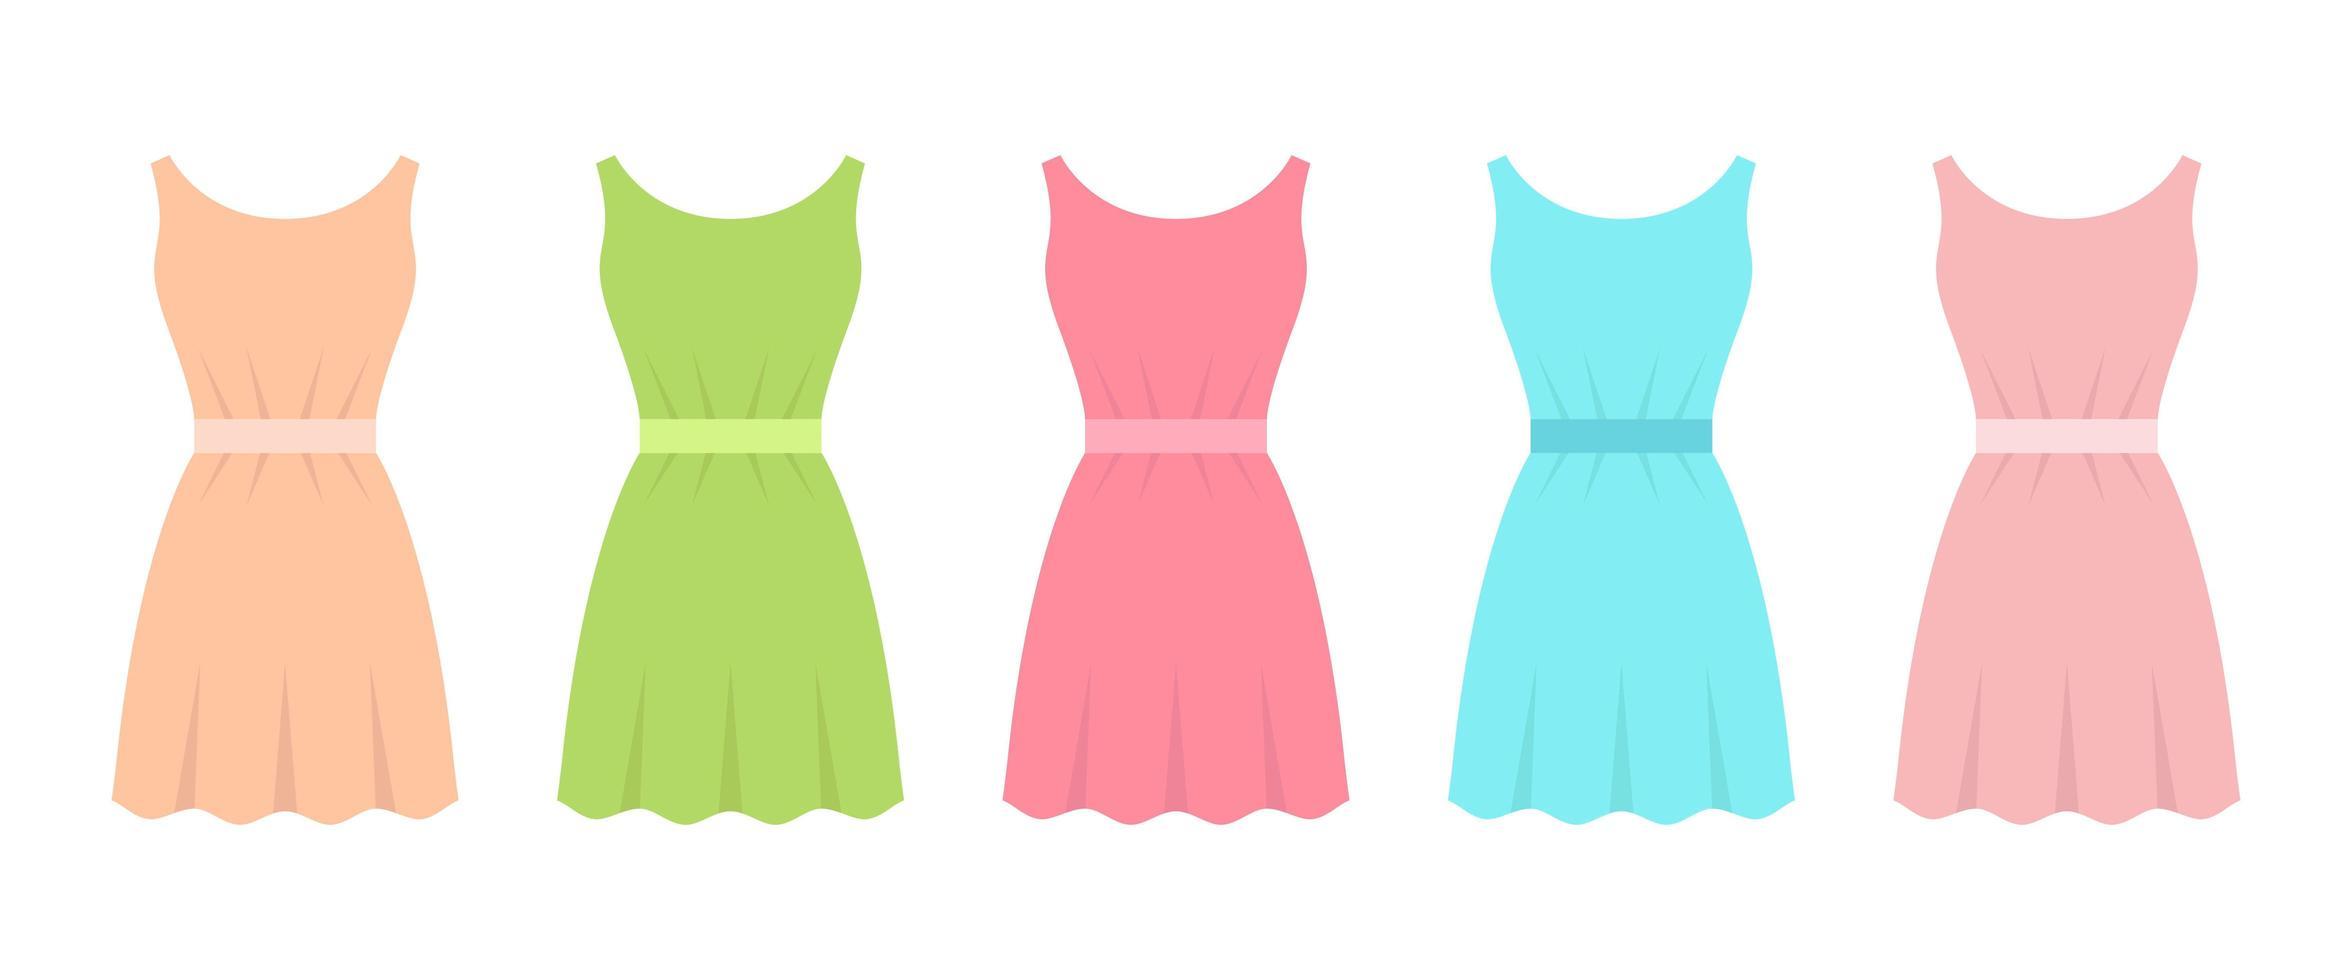 Dress in flat design vector design illustration isolated on white background